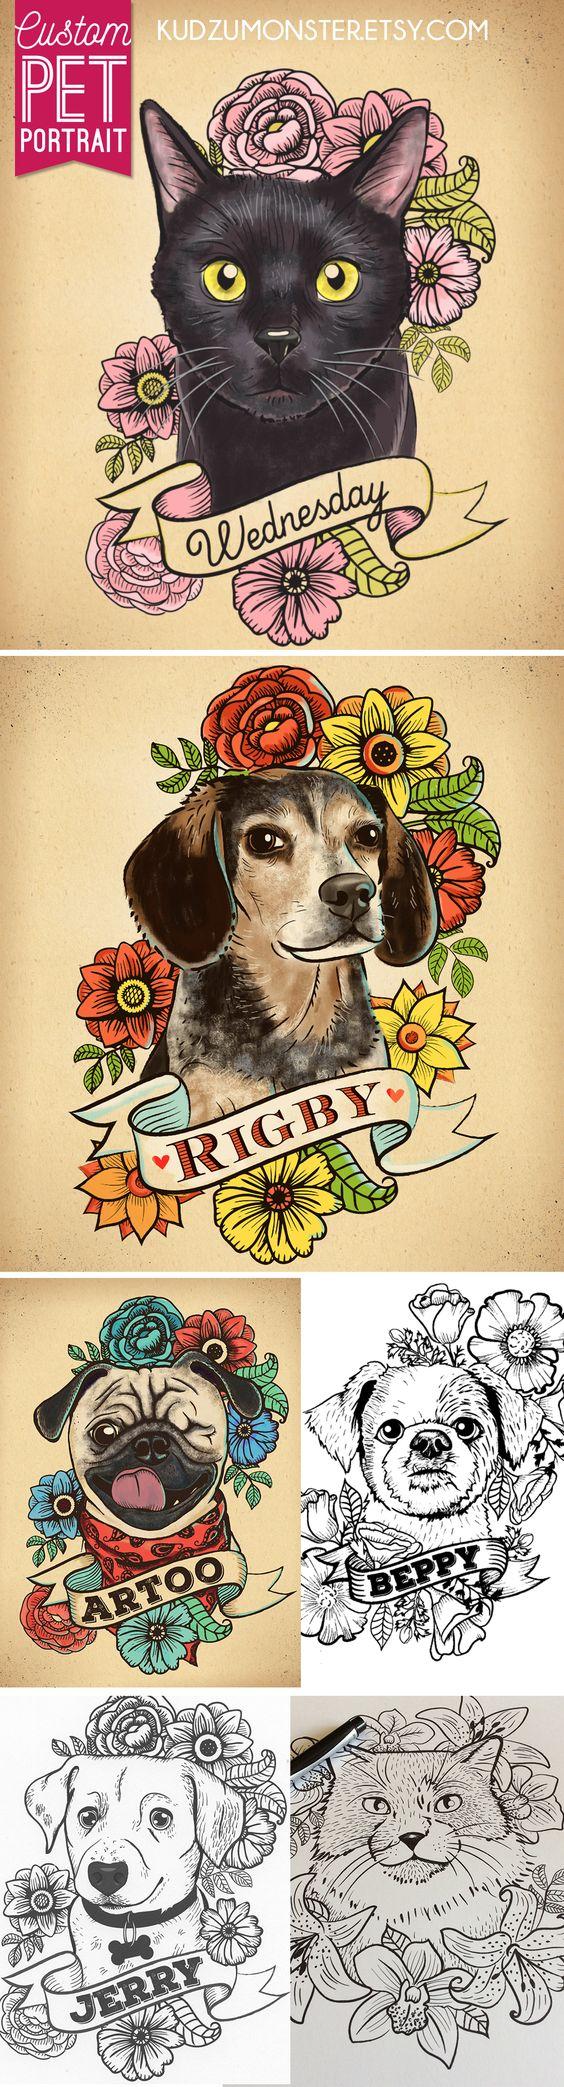 custom dog and cat pet portraits from kudzumonsteretsy